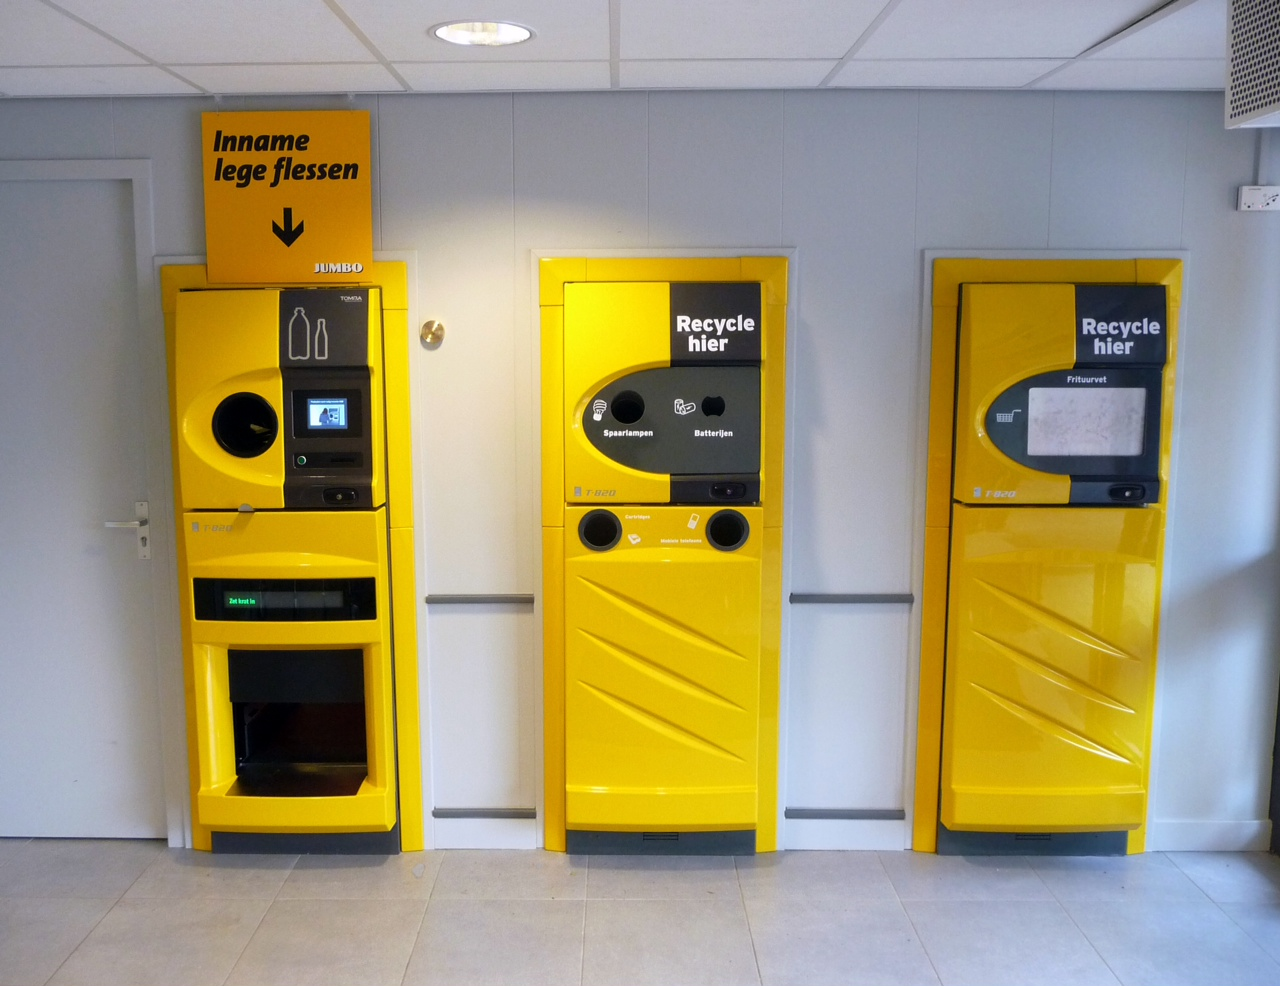 Автоматы для приёма бутылок, неисправных ламп и масла для фритюра в супермаркете Jumbo. Фото: Tomra Systems/Wikimedia/CC-BY-SA-3.0.